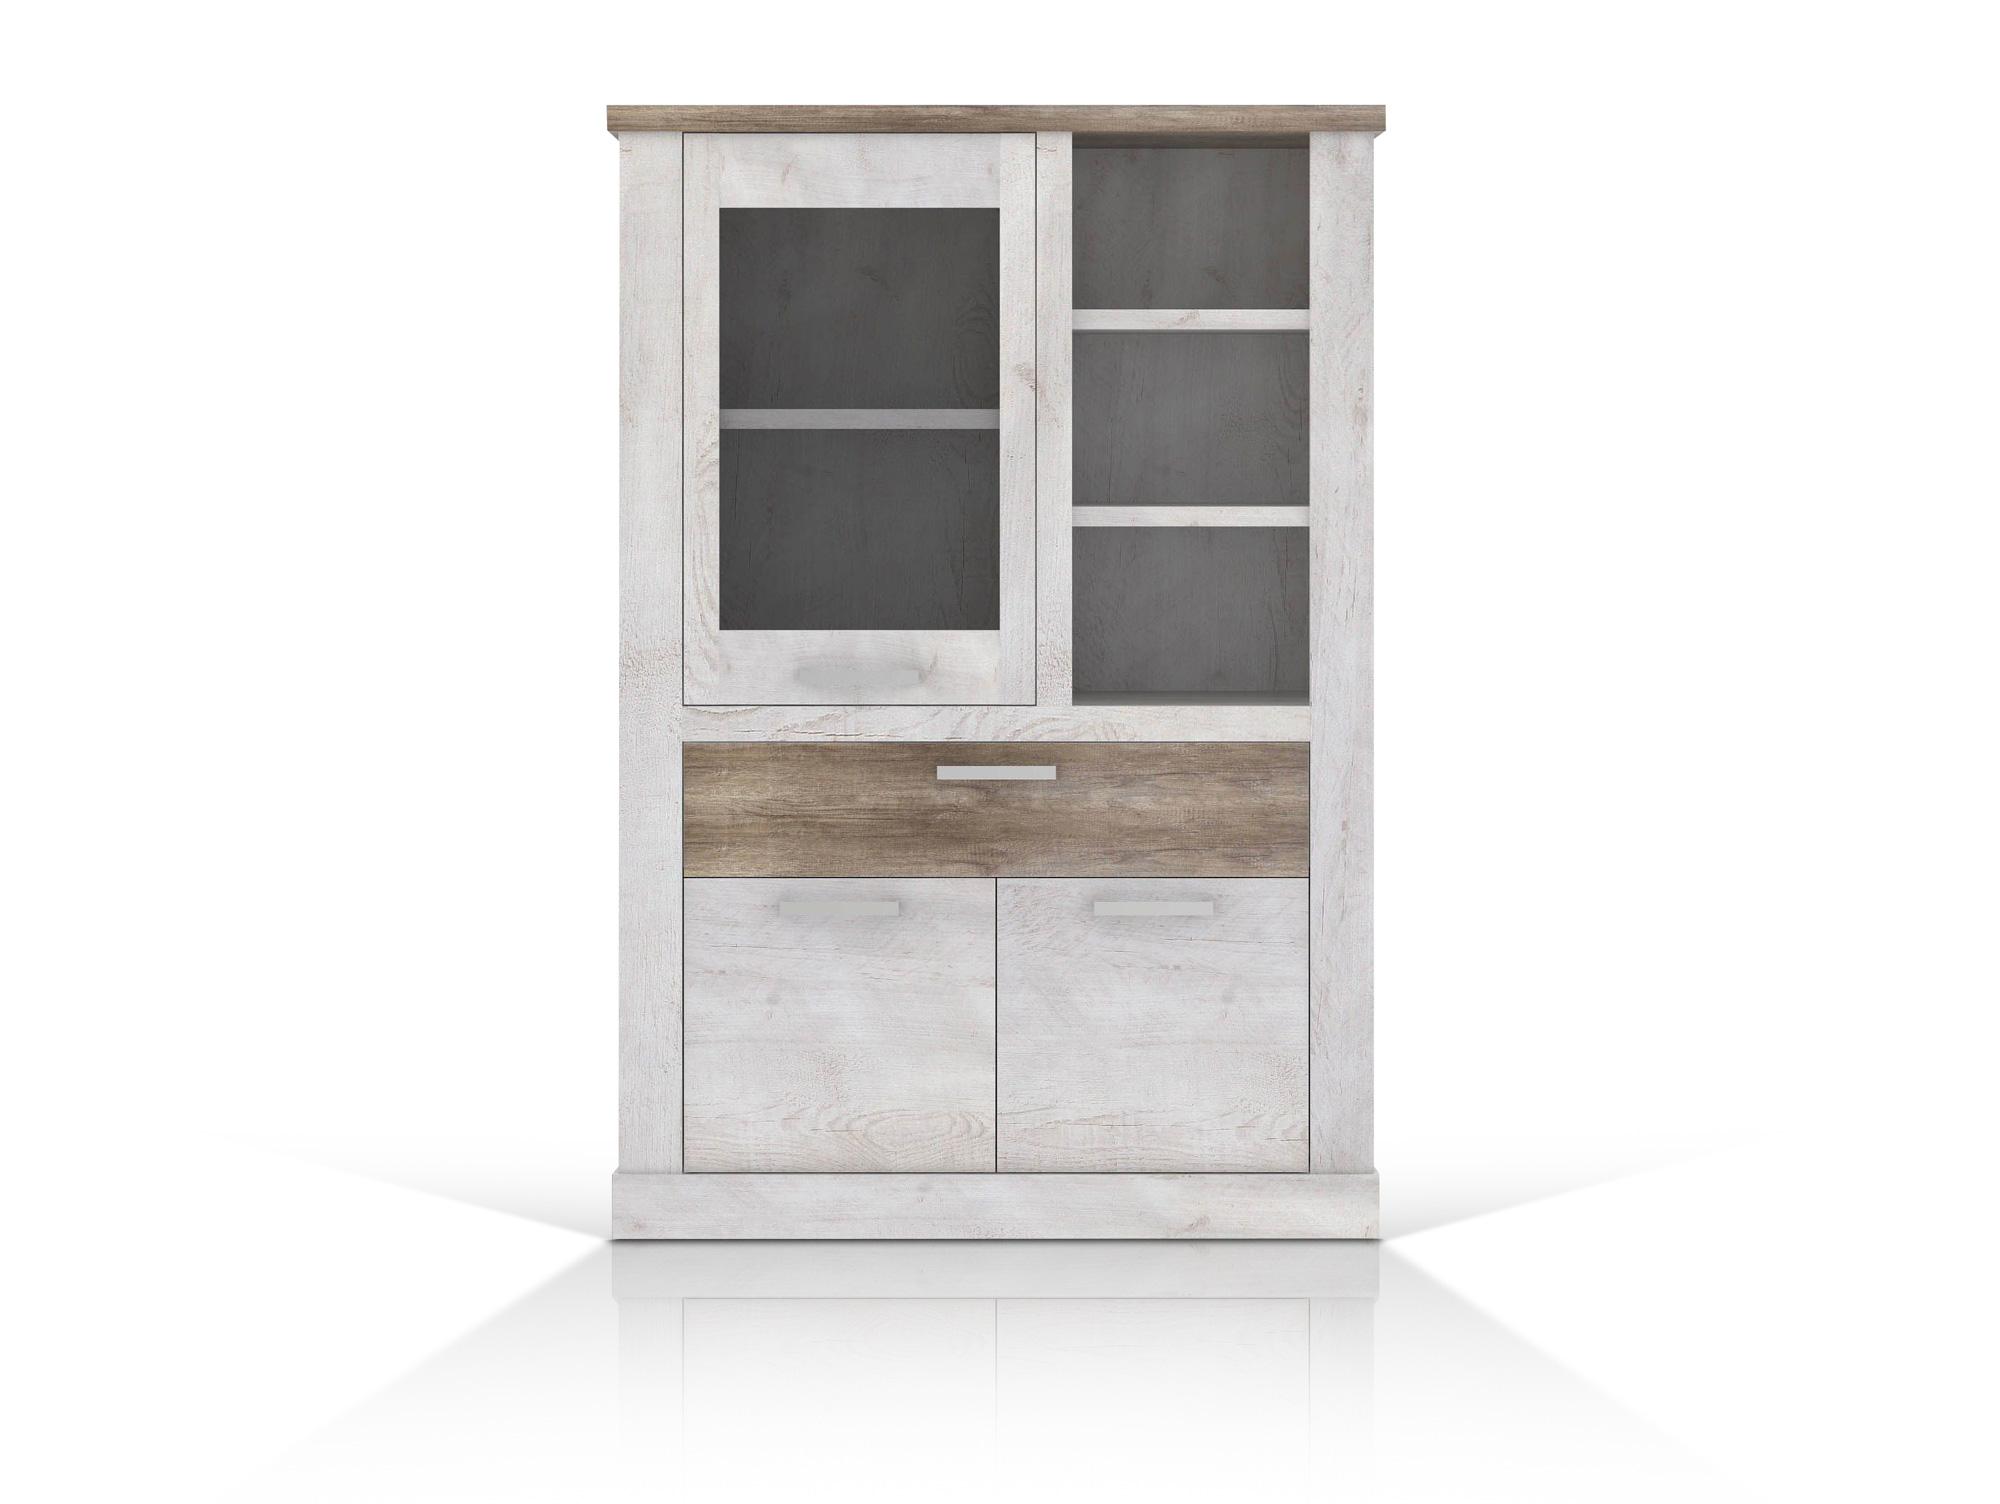 dario ii wohnwand pinie weiss. Black Bedroom Furniture Sets. Home Design Ideas